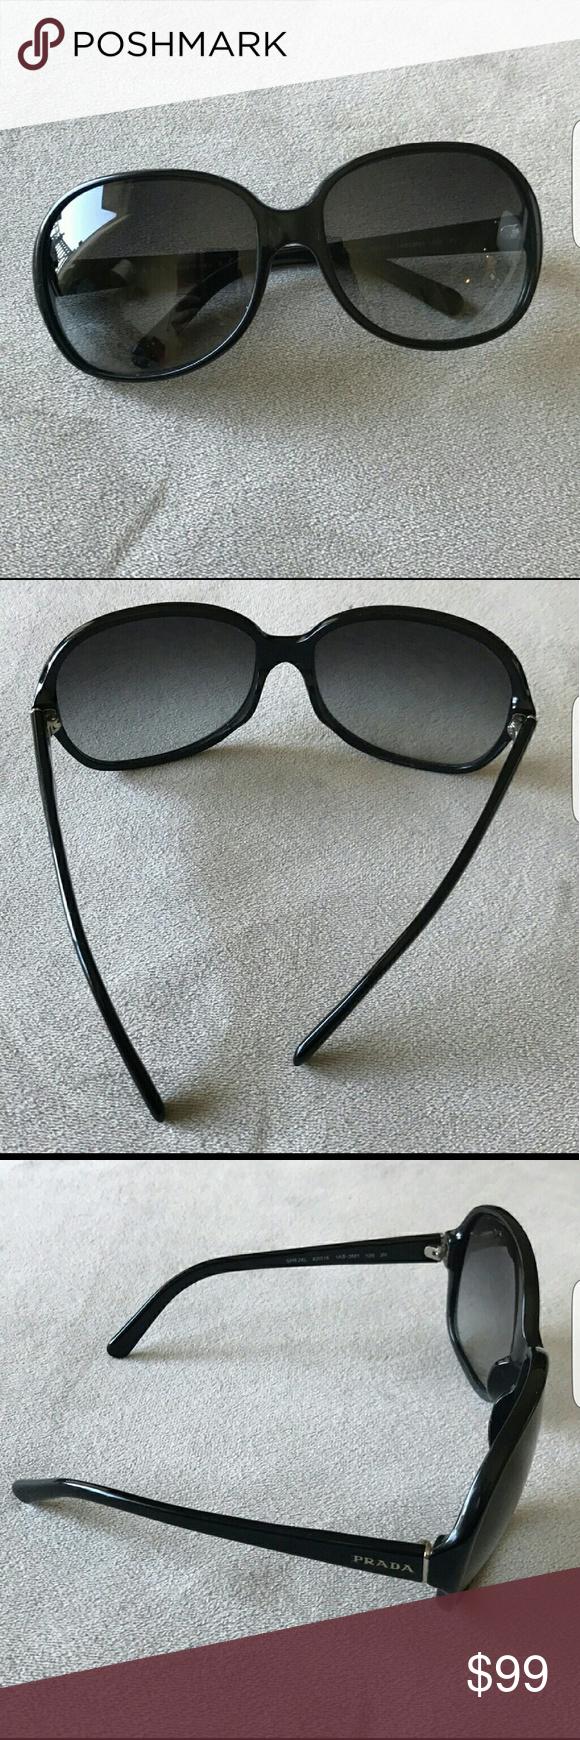 772913159c639 ... official store prada sunglasses euc no scratches authentic black  gradient prada sunglasses. 6fe61 9eac3